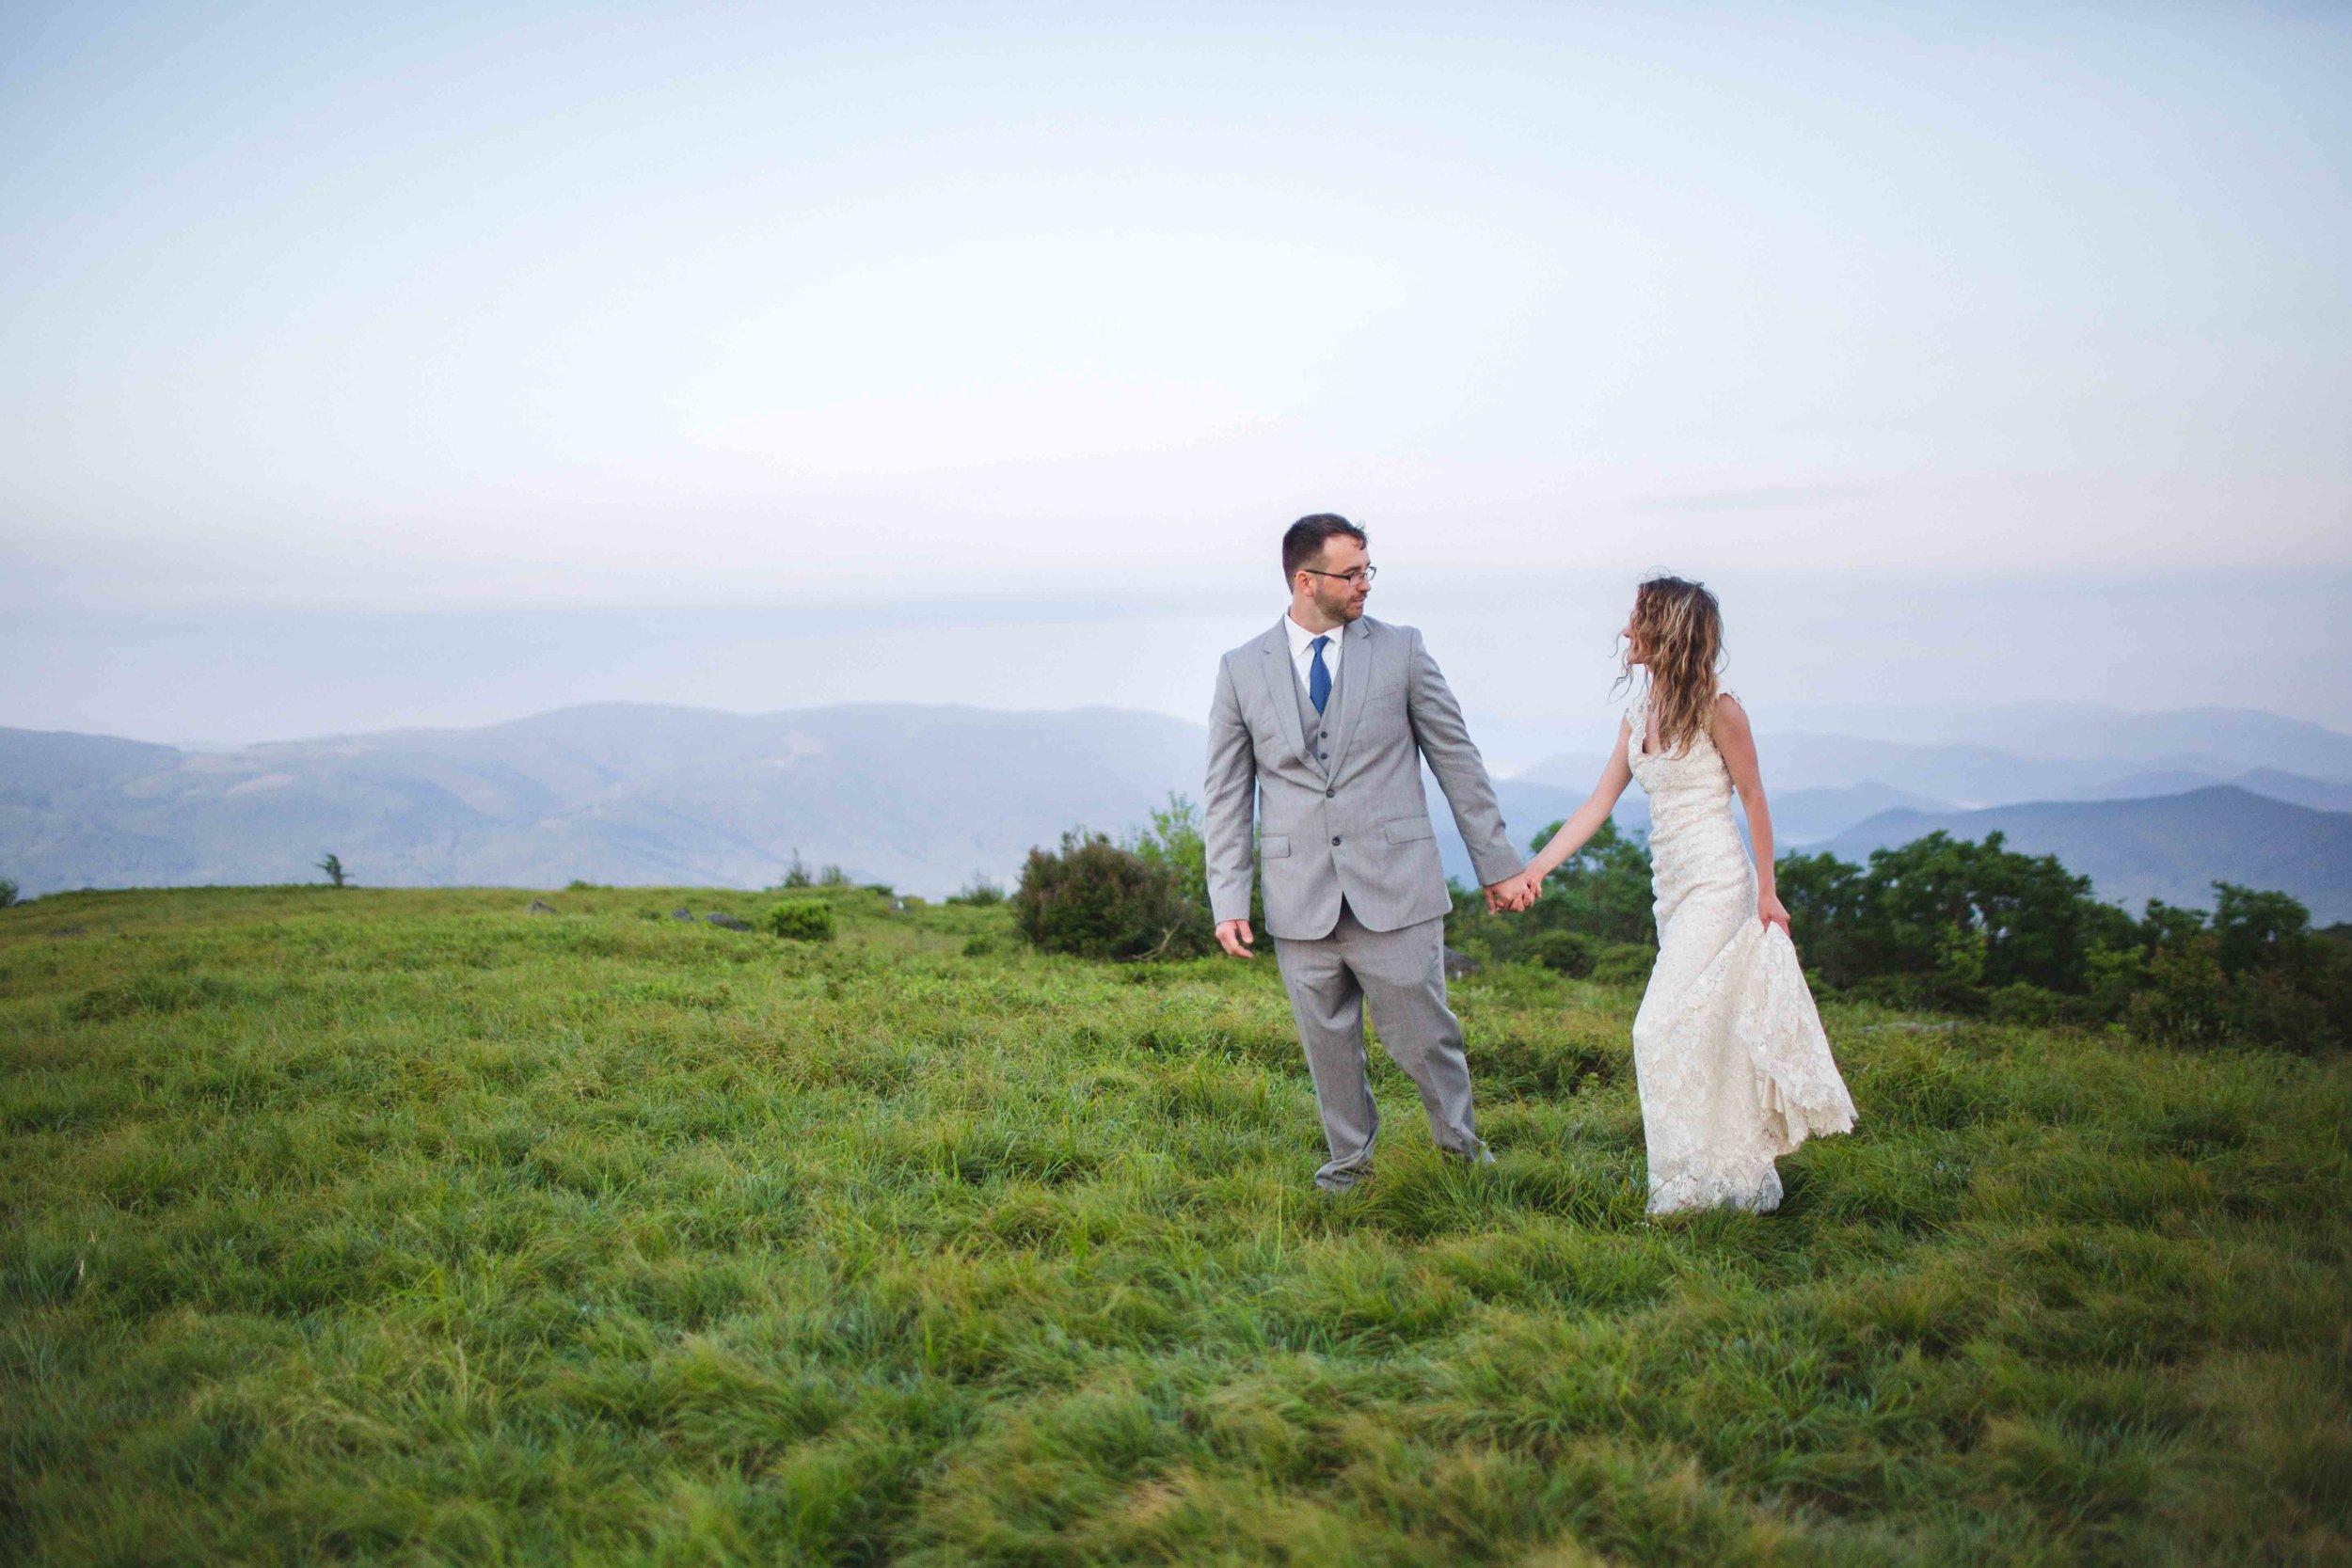 north-carolina-elopement-photographer-63.jpg